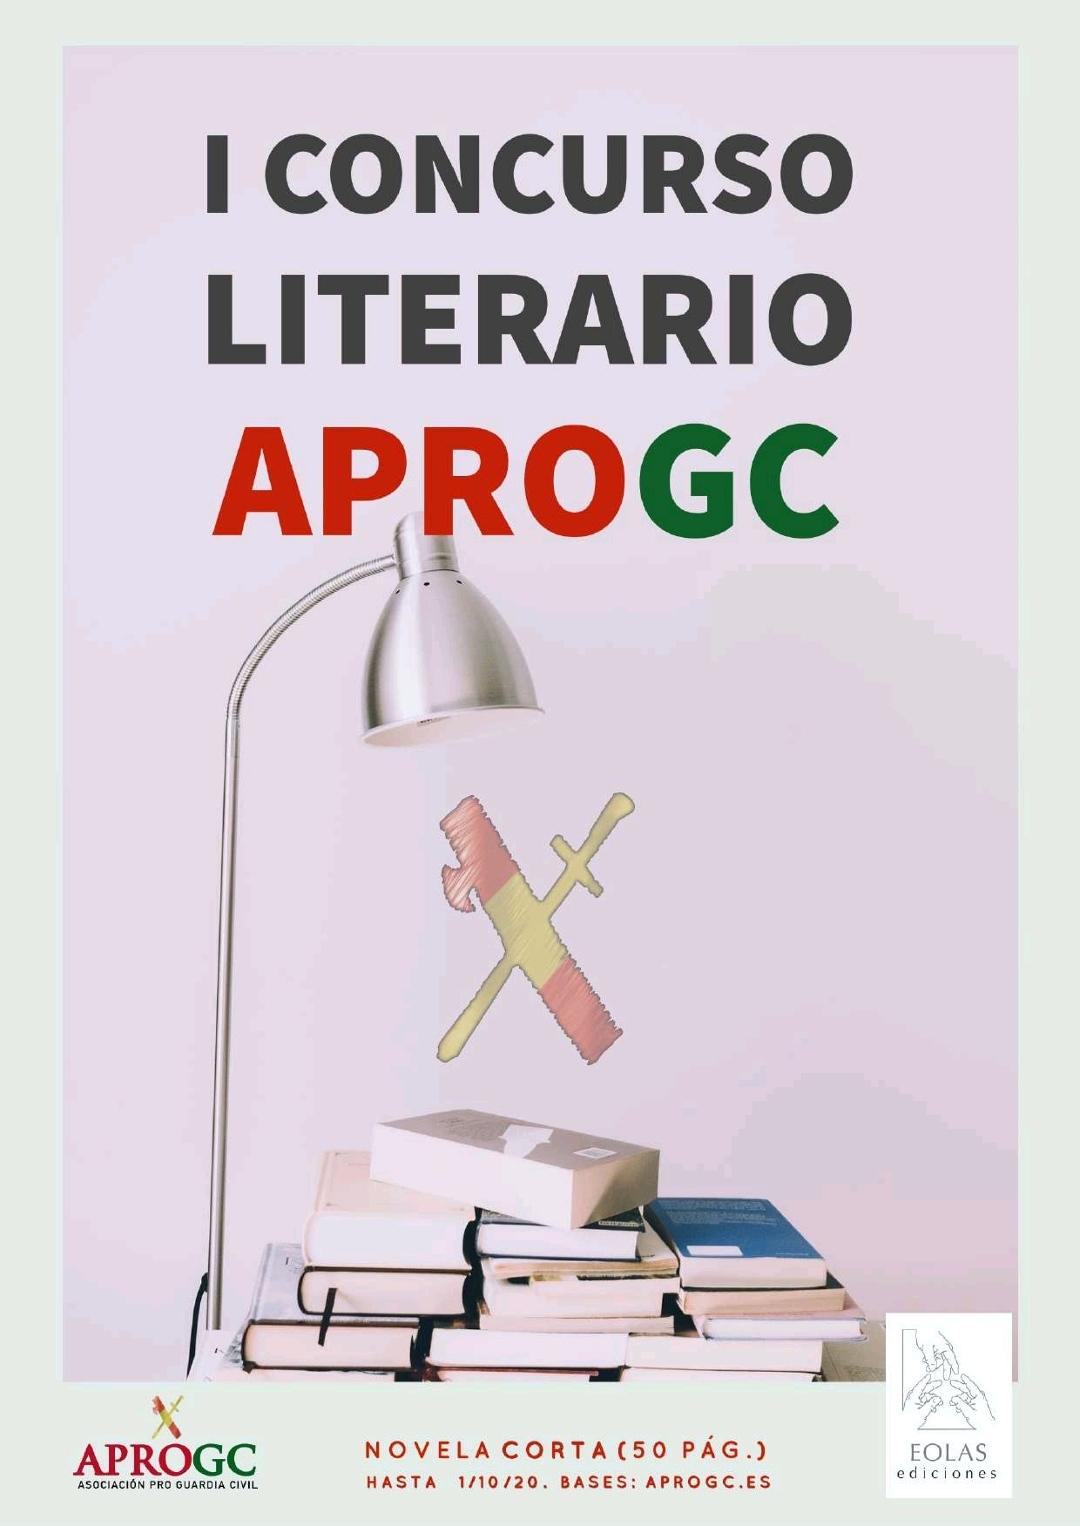 cartel-aprogc-concurso-literario